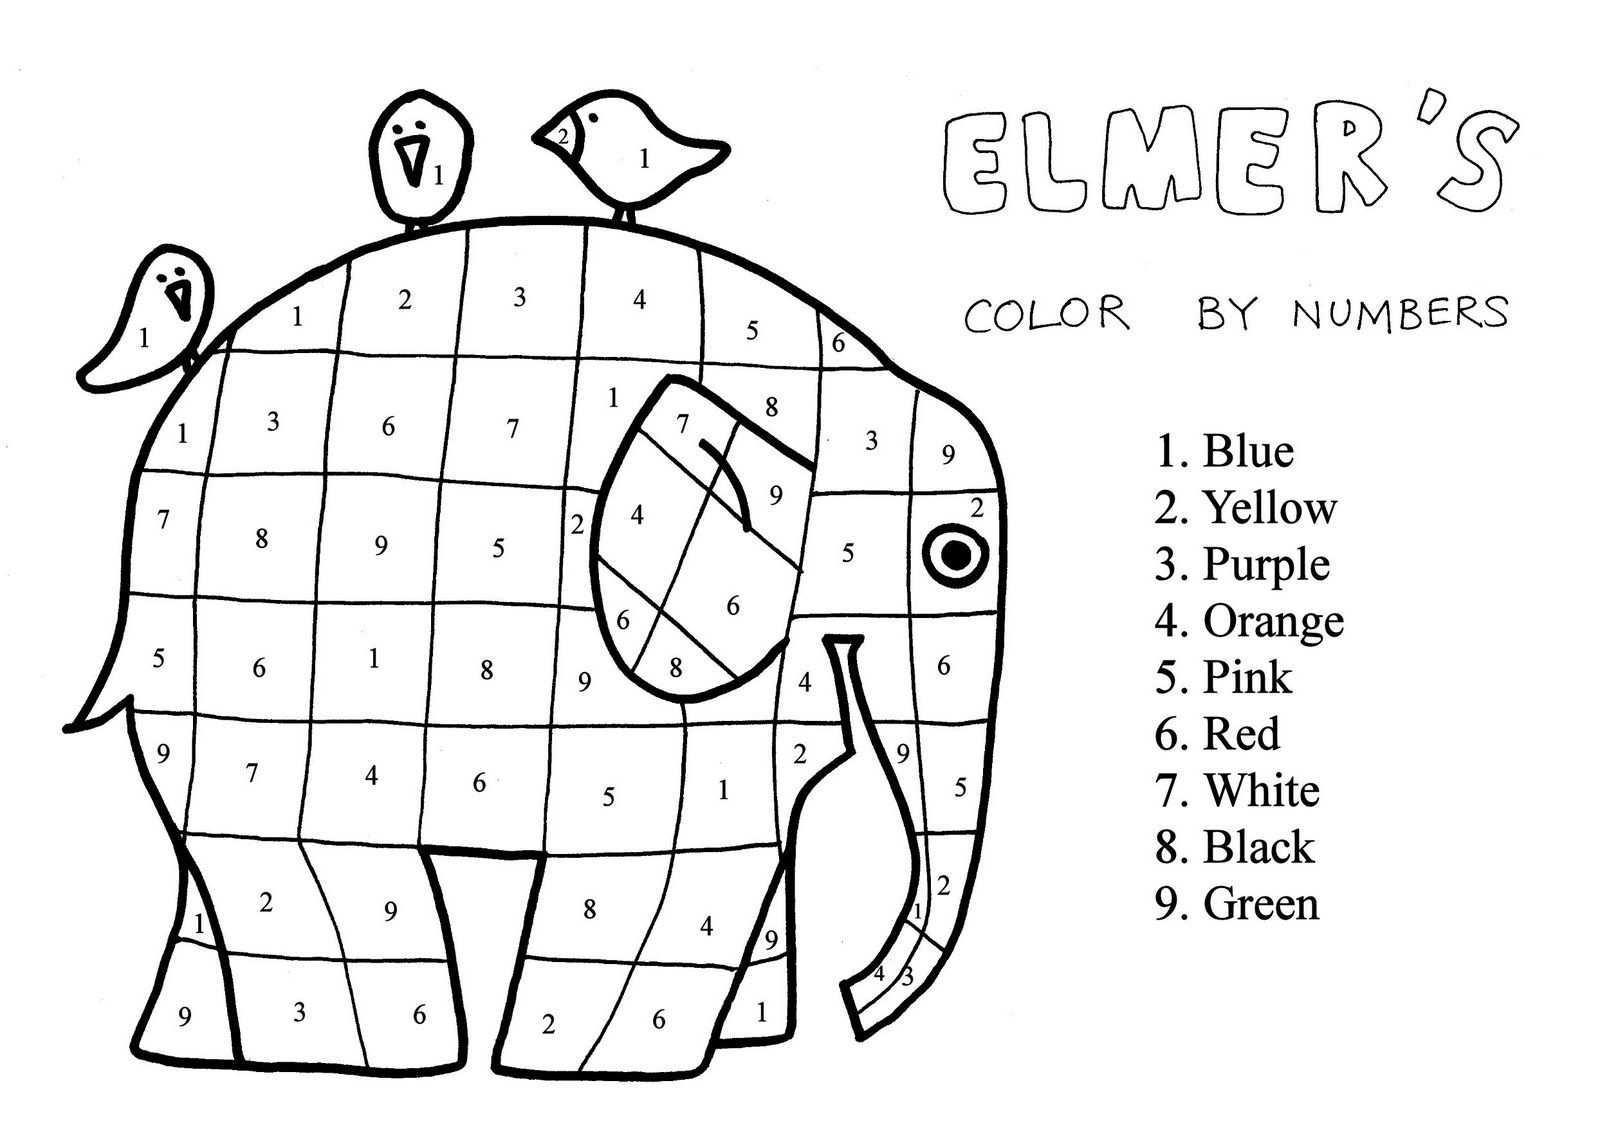 Elmer Teaches Us To Live In Peace Elmar Elefant Elefant Bilderbuch